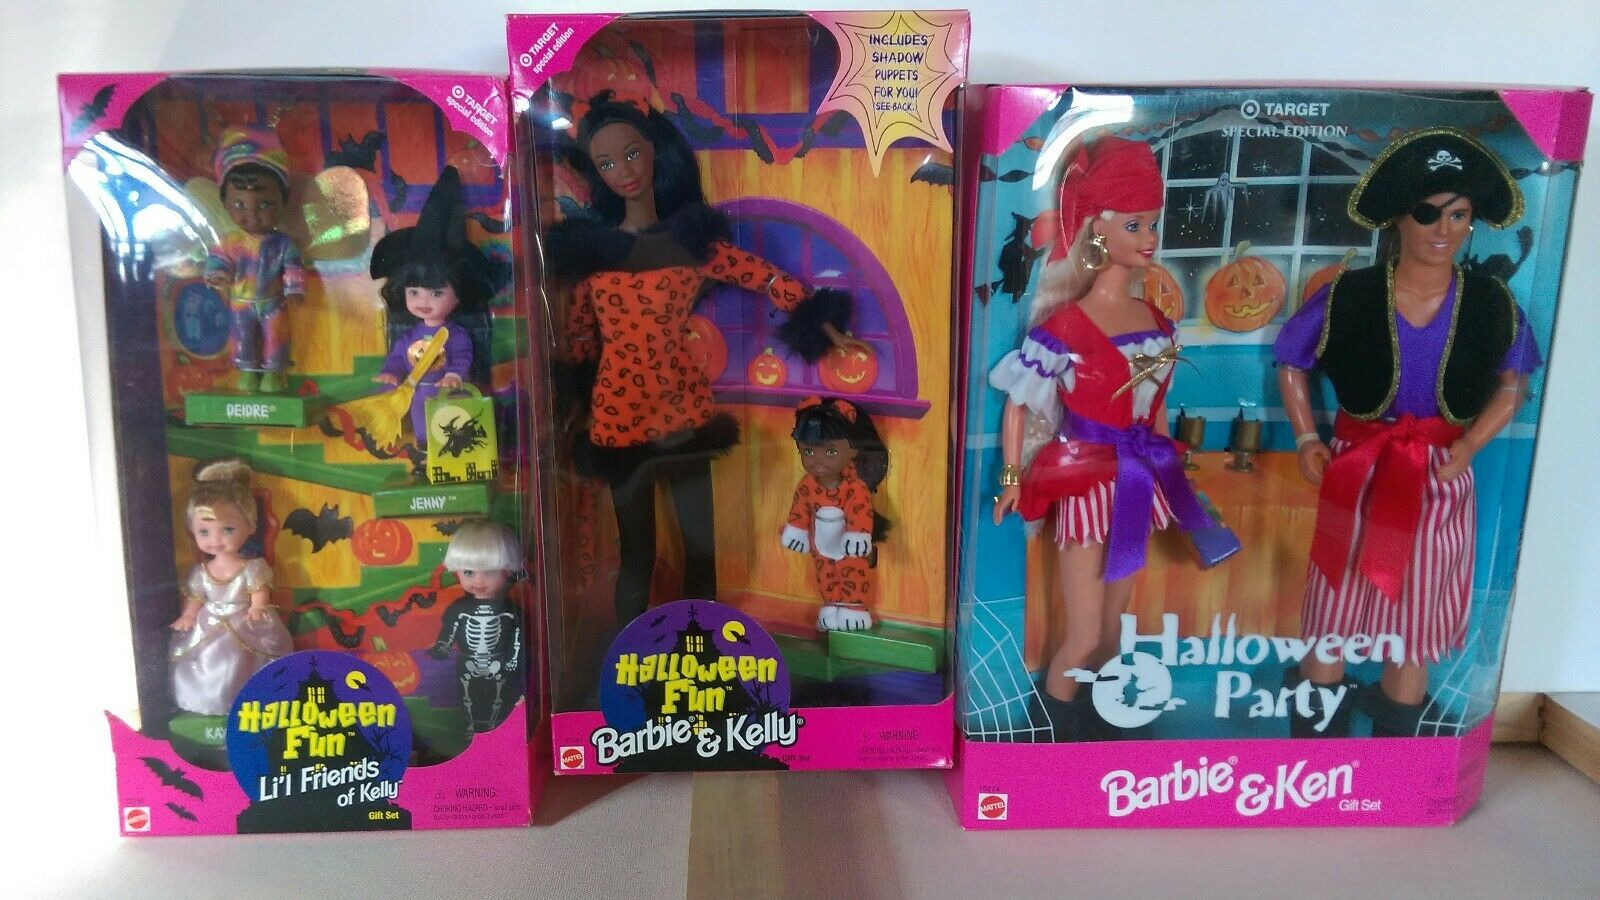 Lote de 3 edición especial de destino 1998 Colección diversión De Halloween Regalo Fiesta Set